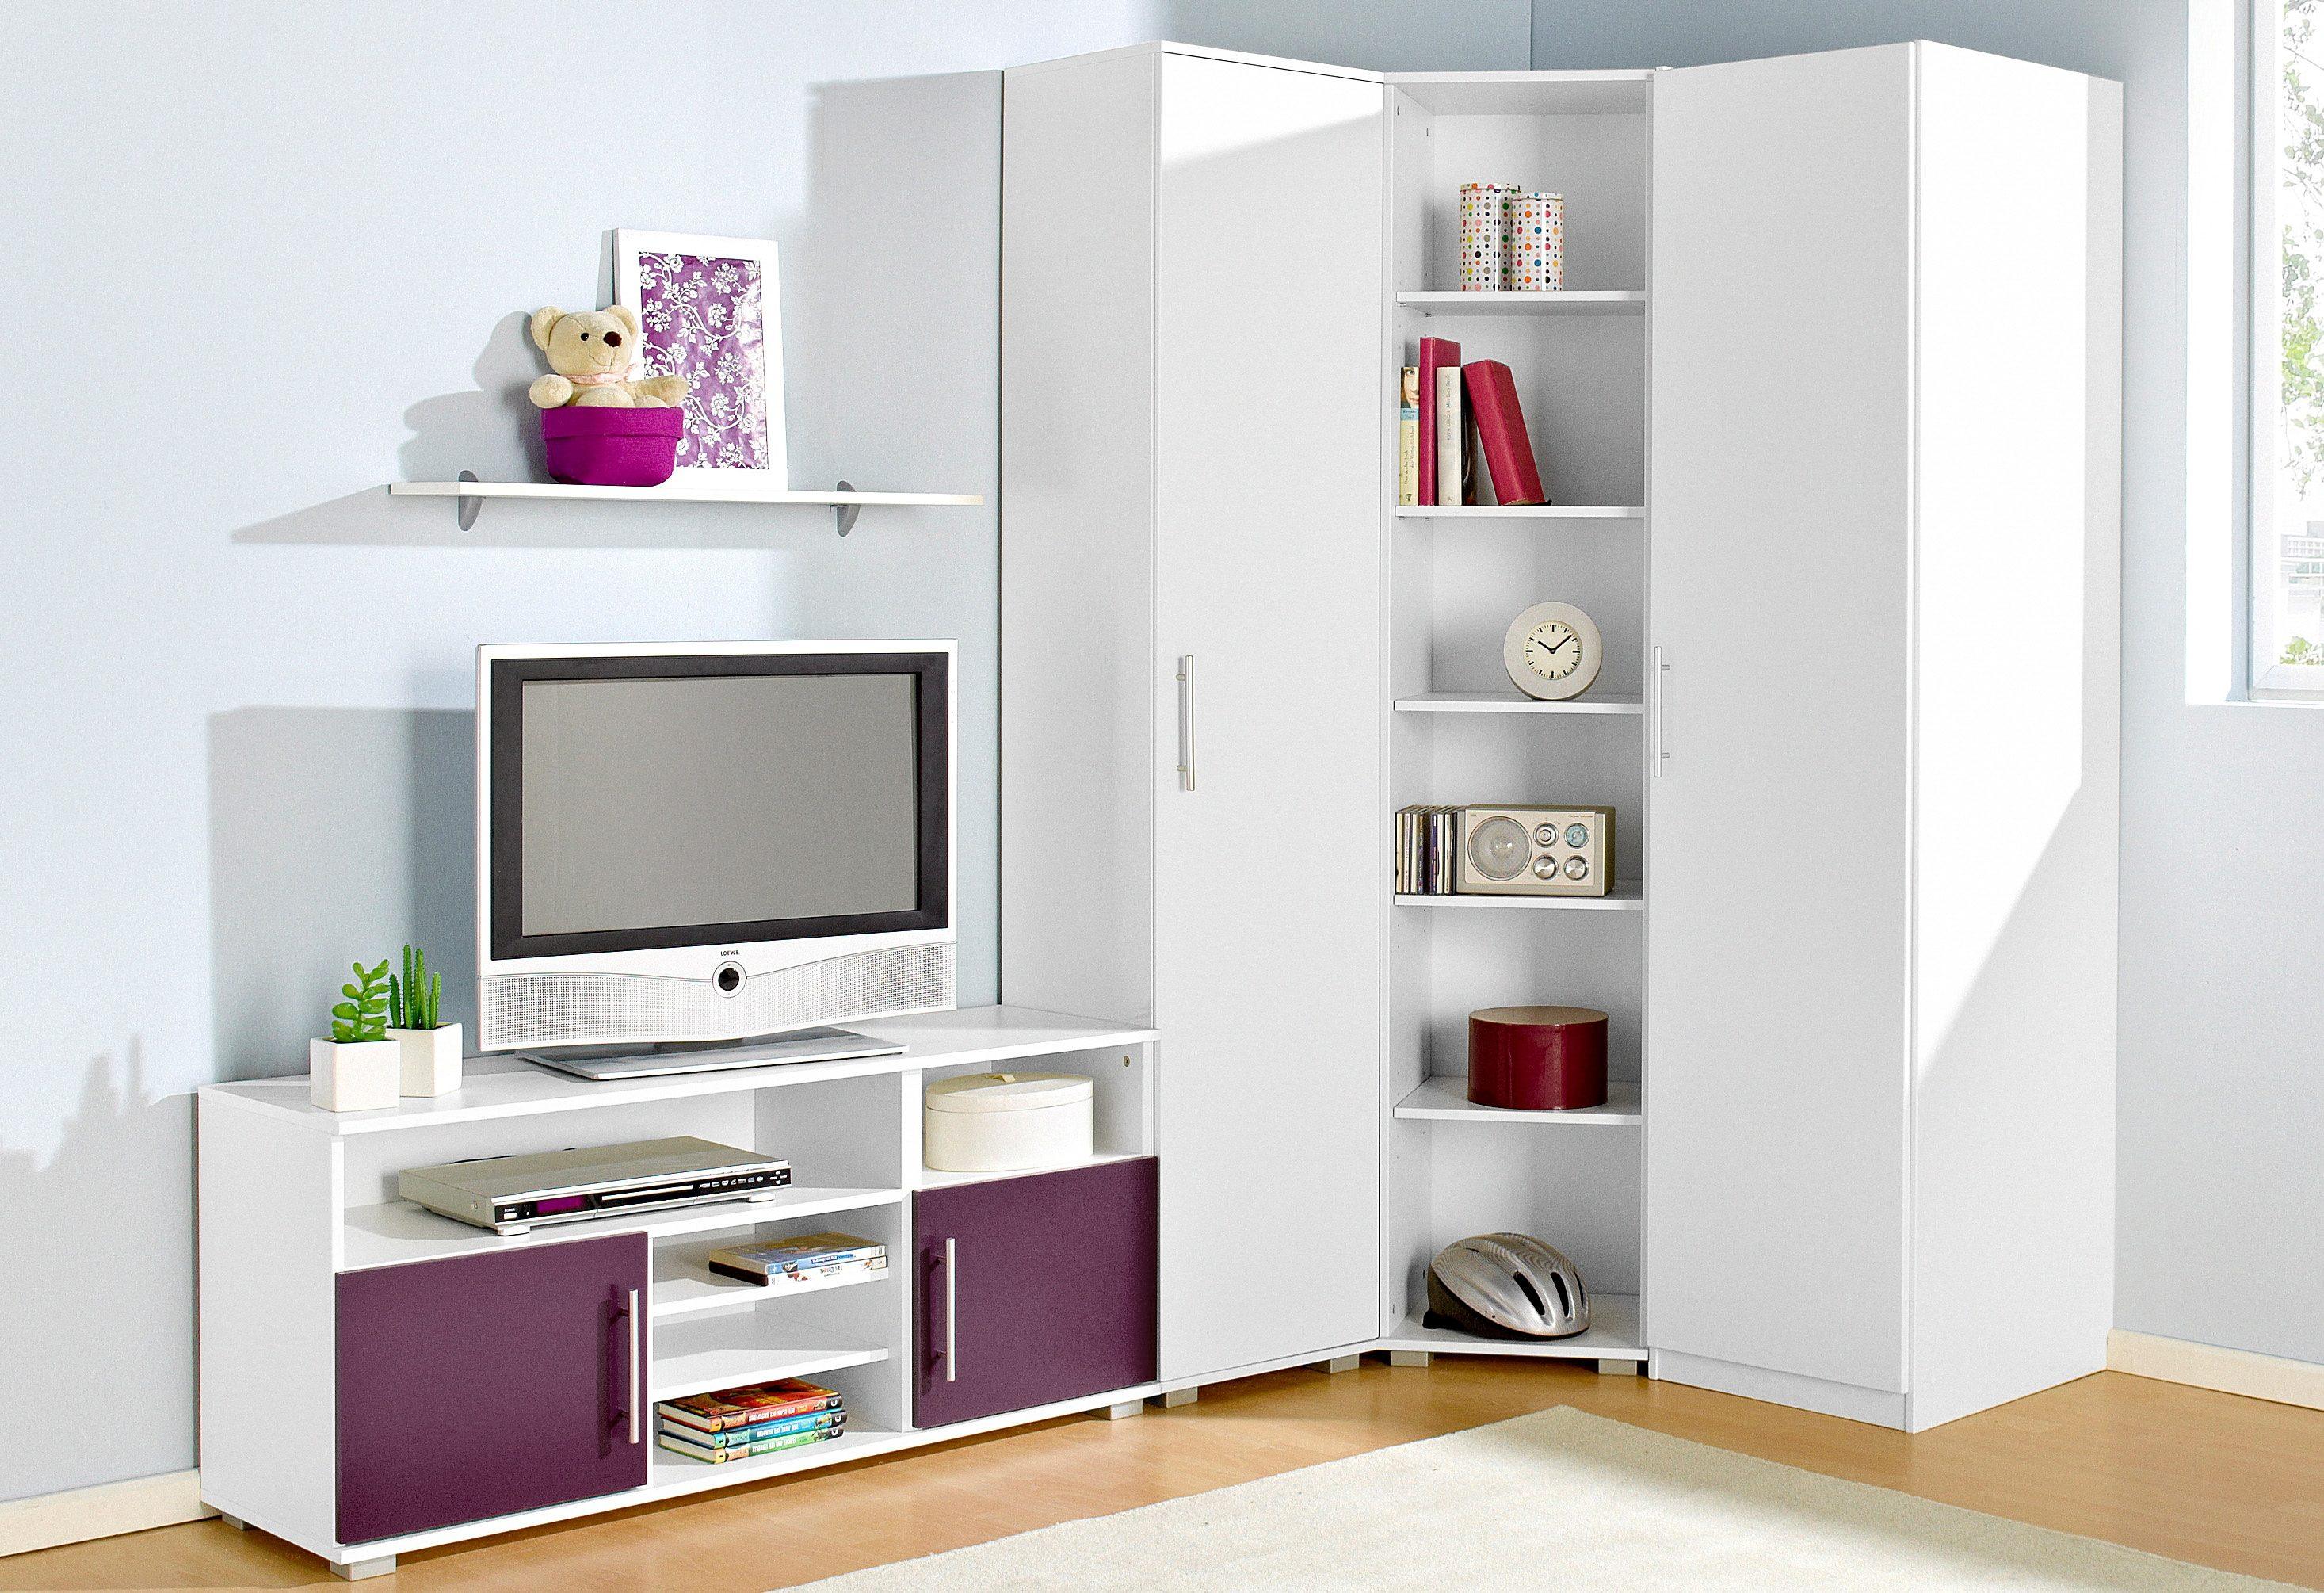 Jugendzimmer-Set (Set 5-tlg) | Kinderzimmer > Jugendzimmer > Komplett-Jugendzimmer | Lila